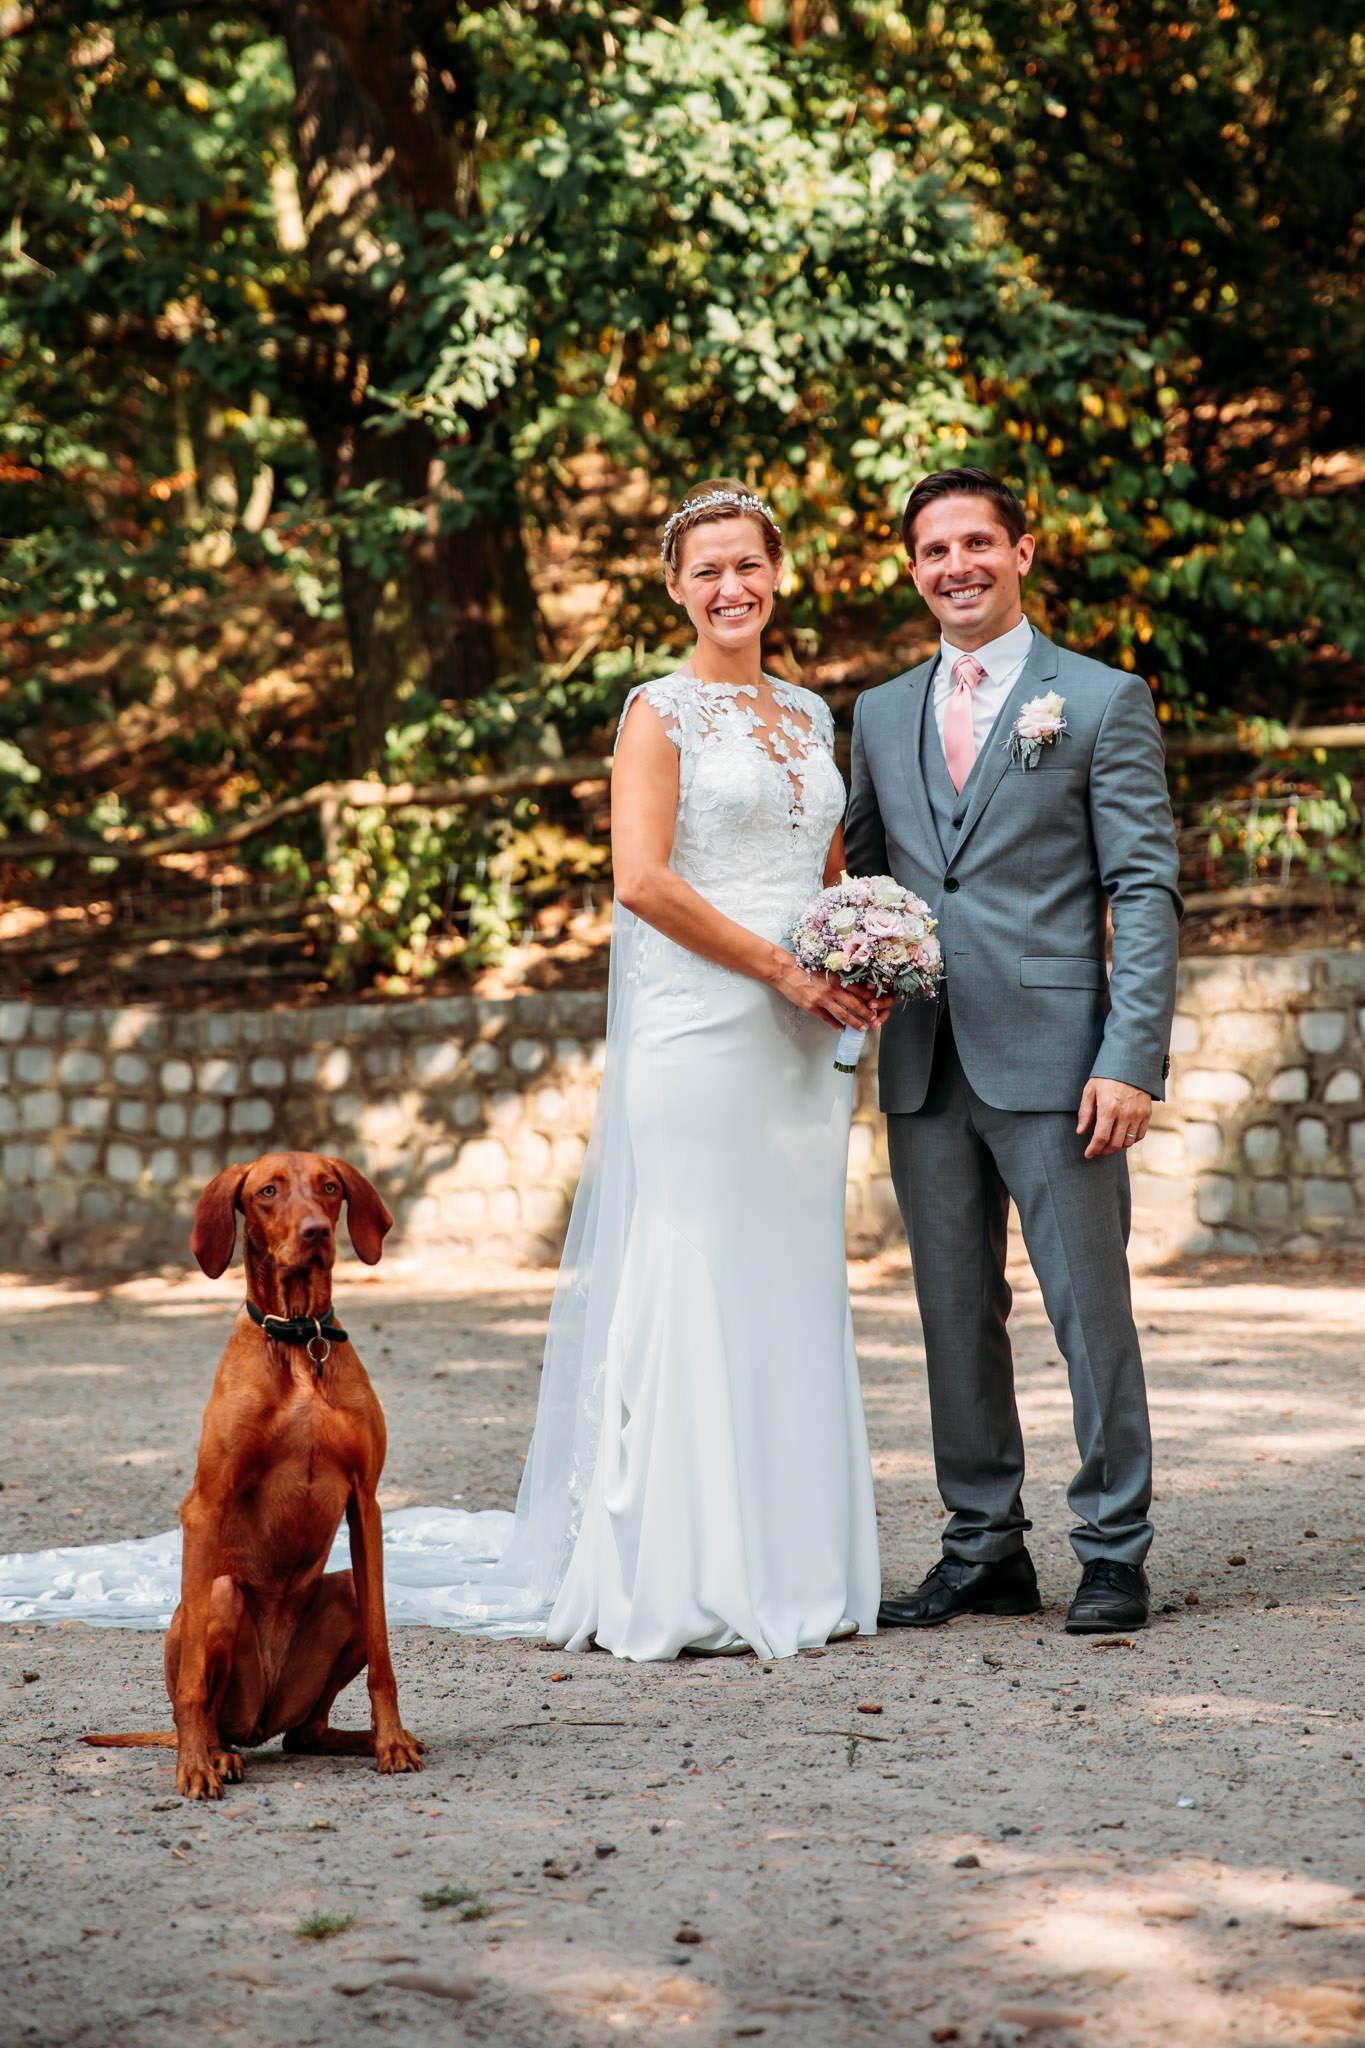 180818_Hochzeit_german_american_grunewald_berlin_locanda_12_apostoli_wedding_web_0016.jpg